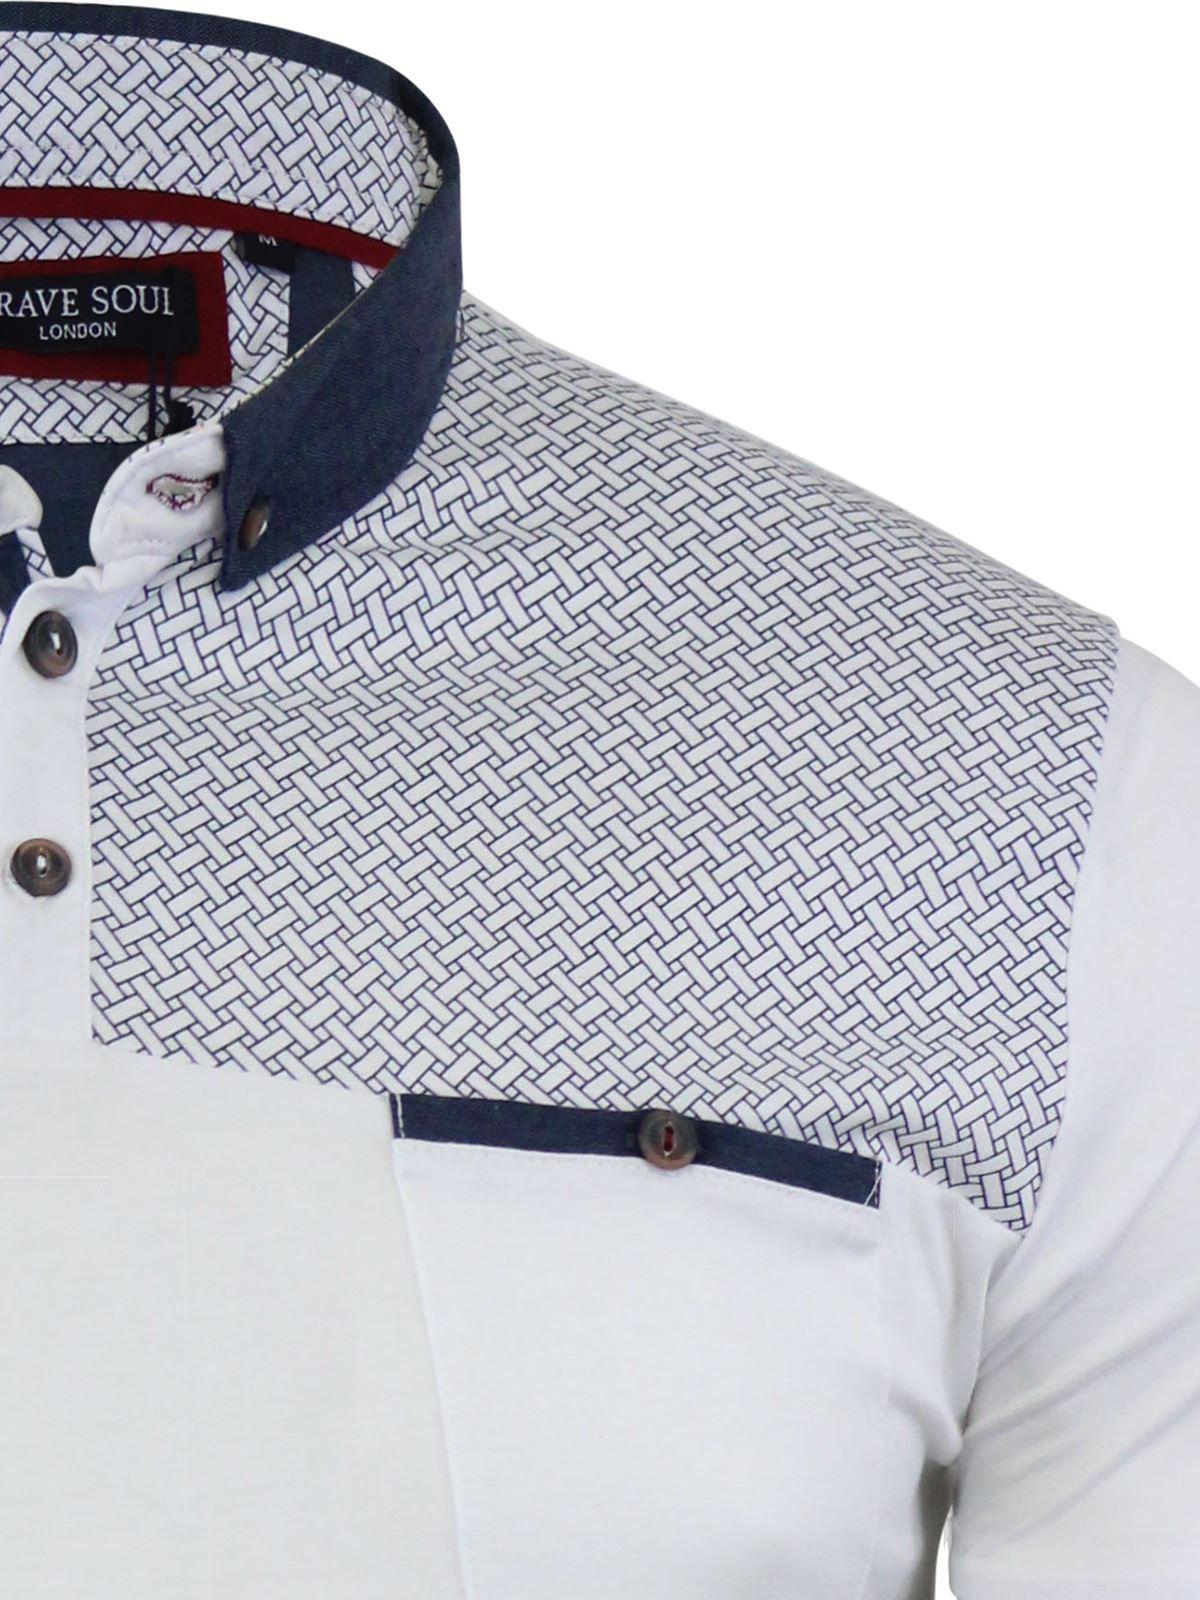 Mens-Polo-T-Shirt-Brave-Soul-Aqua-Printed-Short-Sleeve-Chambray-Collar-Top thumbnail 10